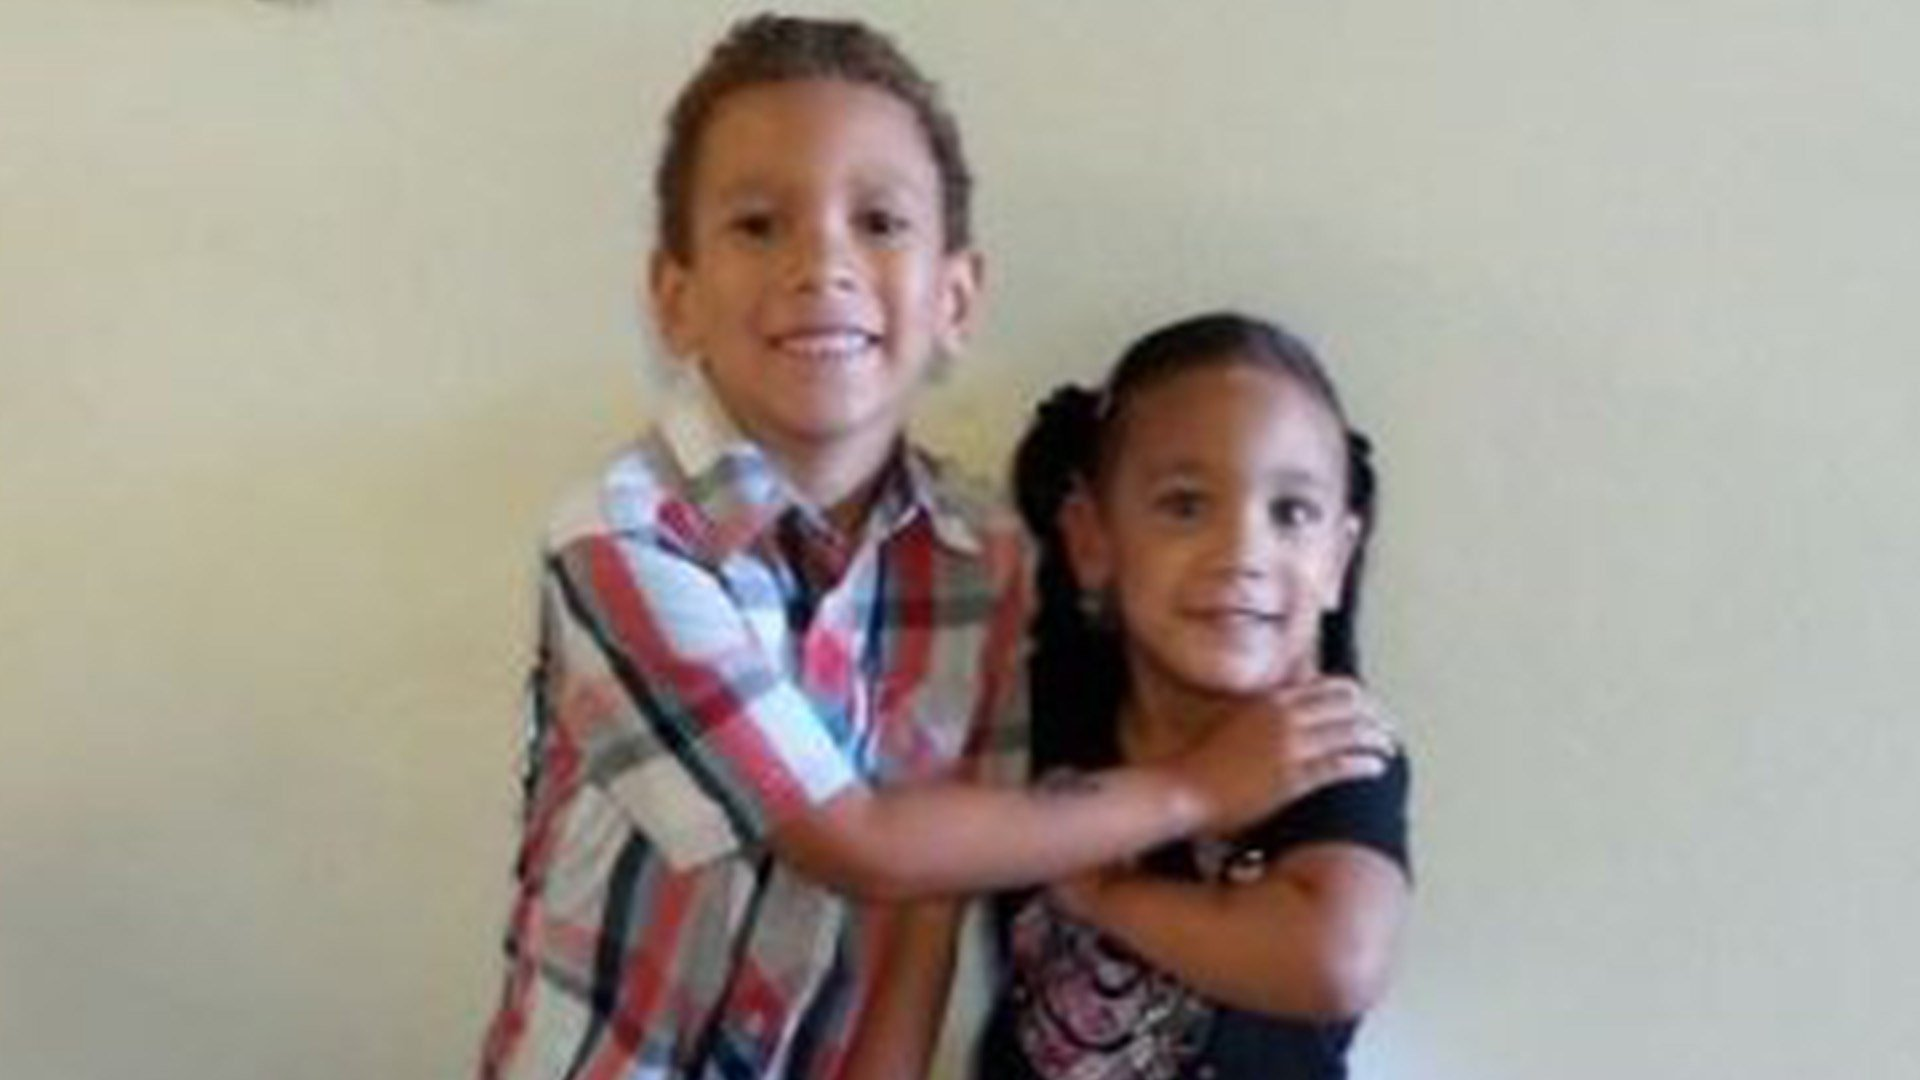 Noah and Sophia Murphy were stabbed to death in Colorado Springs.